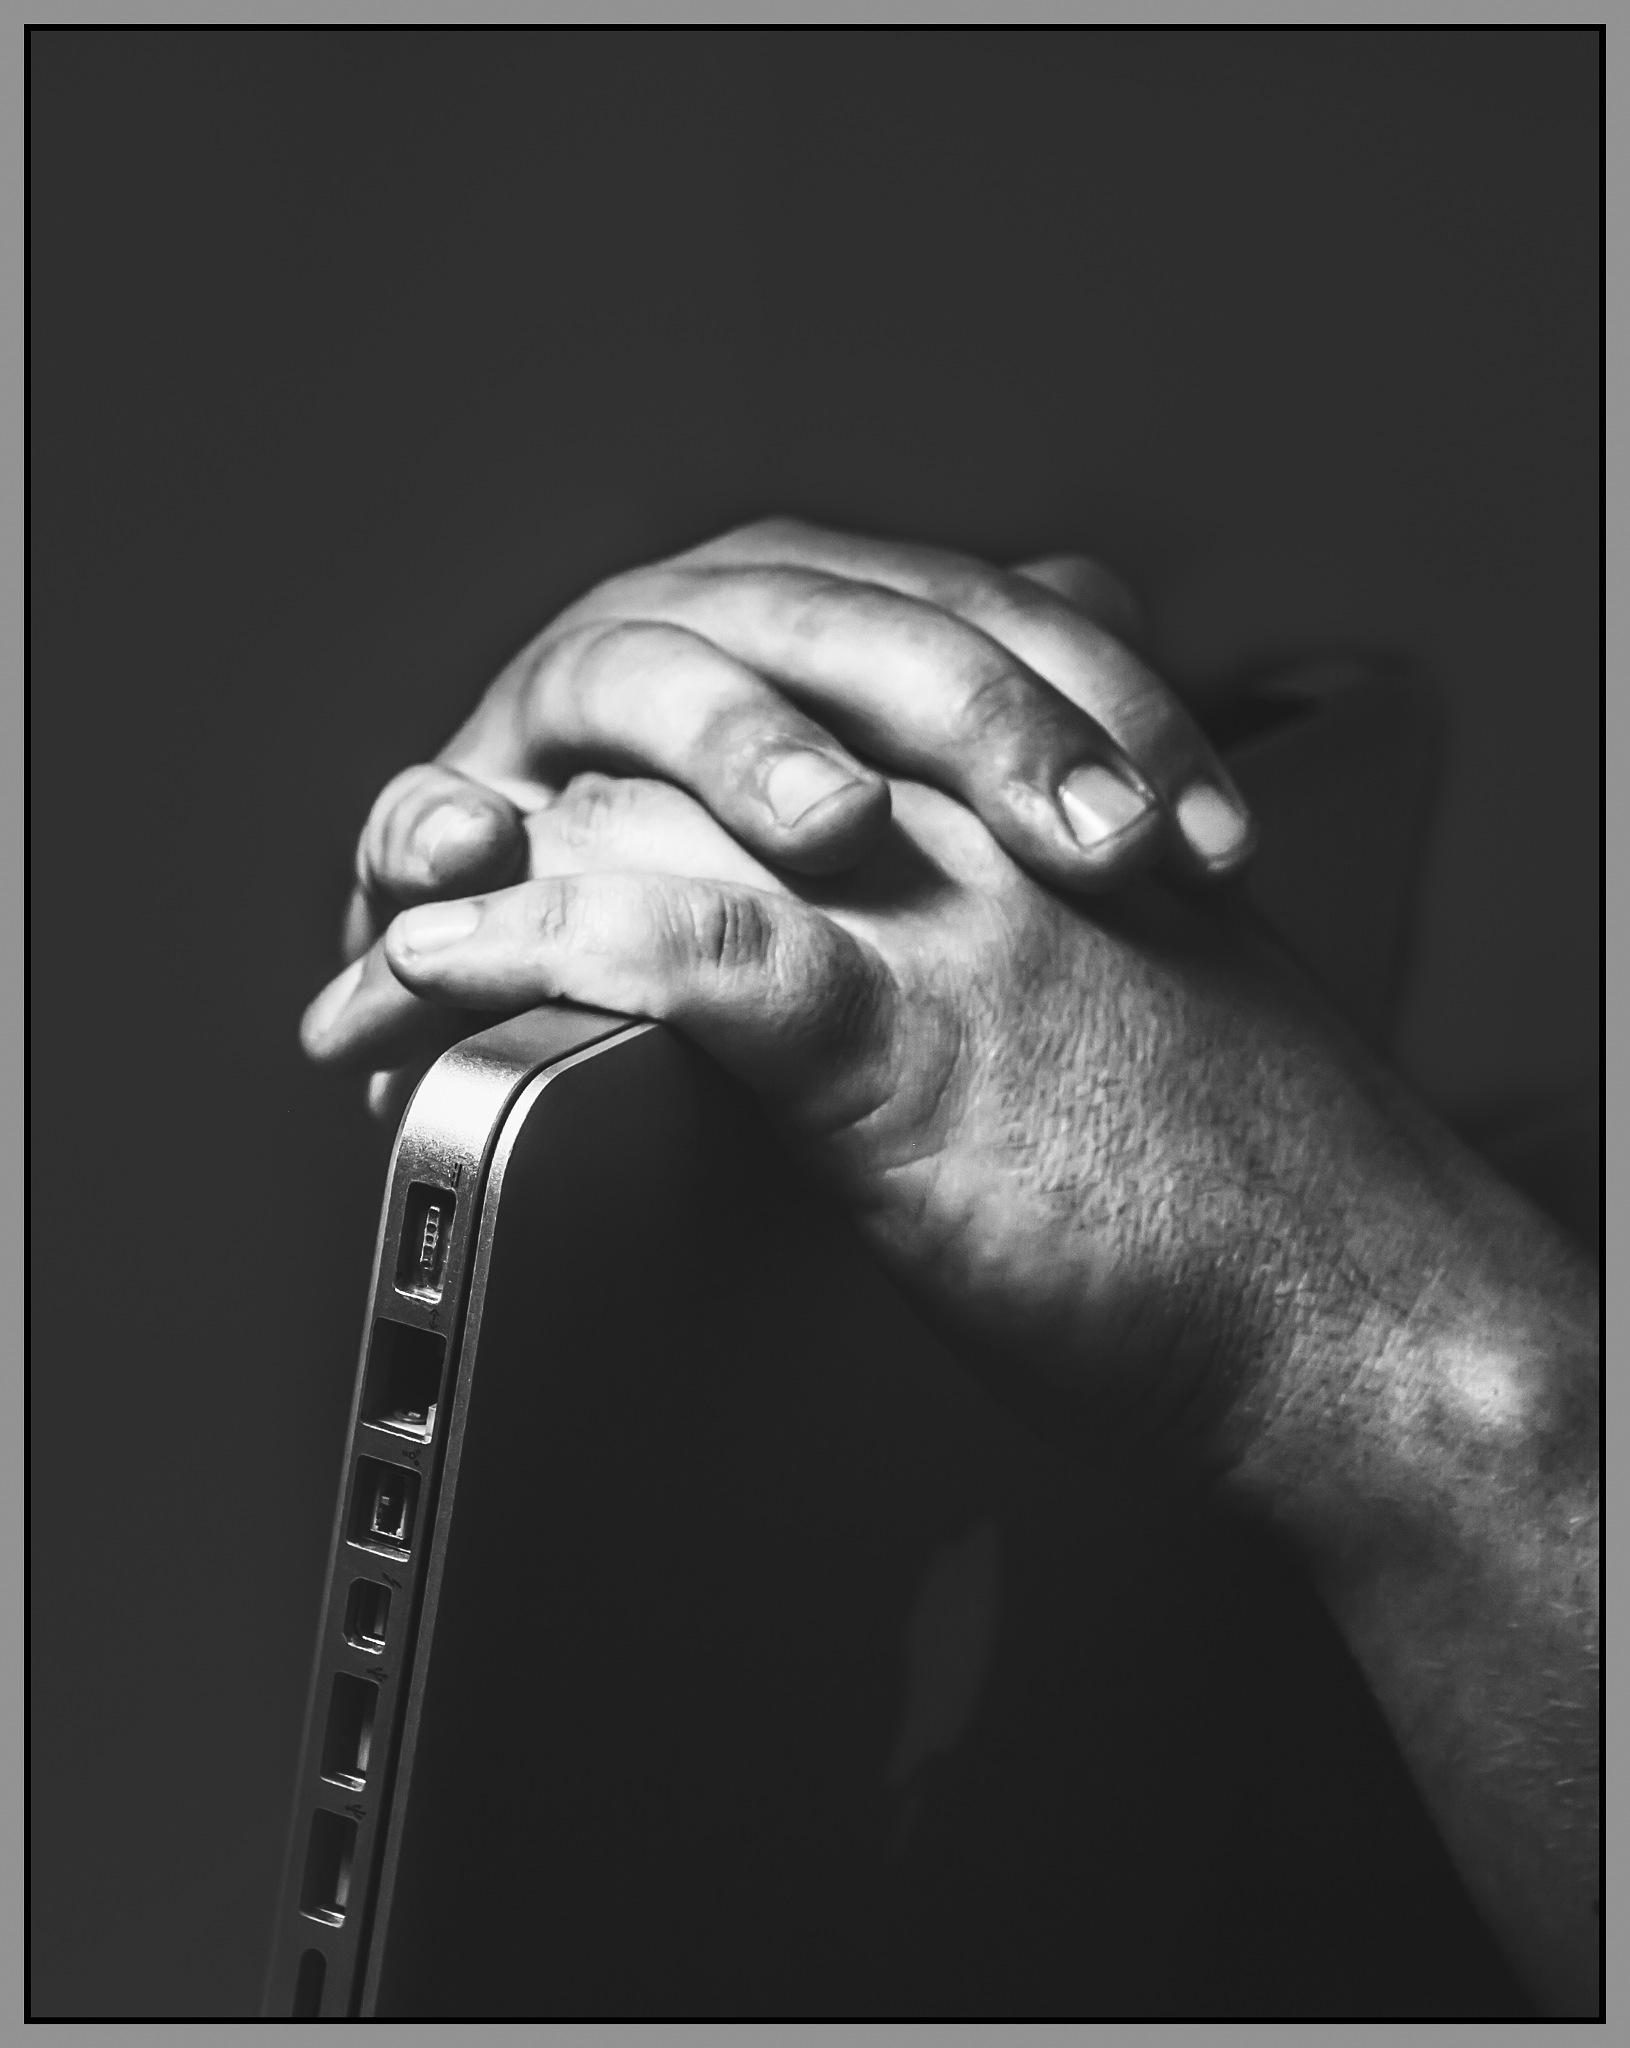 Hands by benny_b